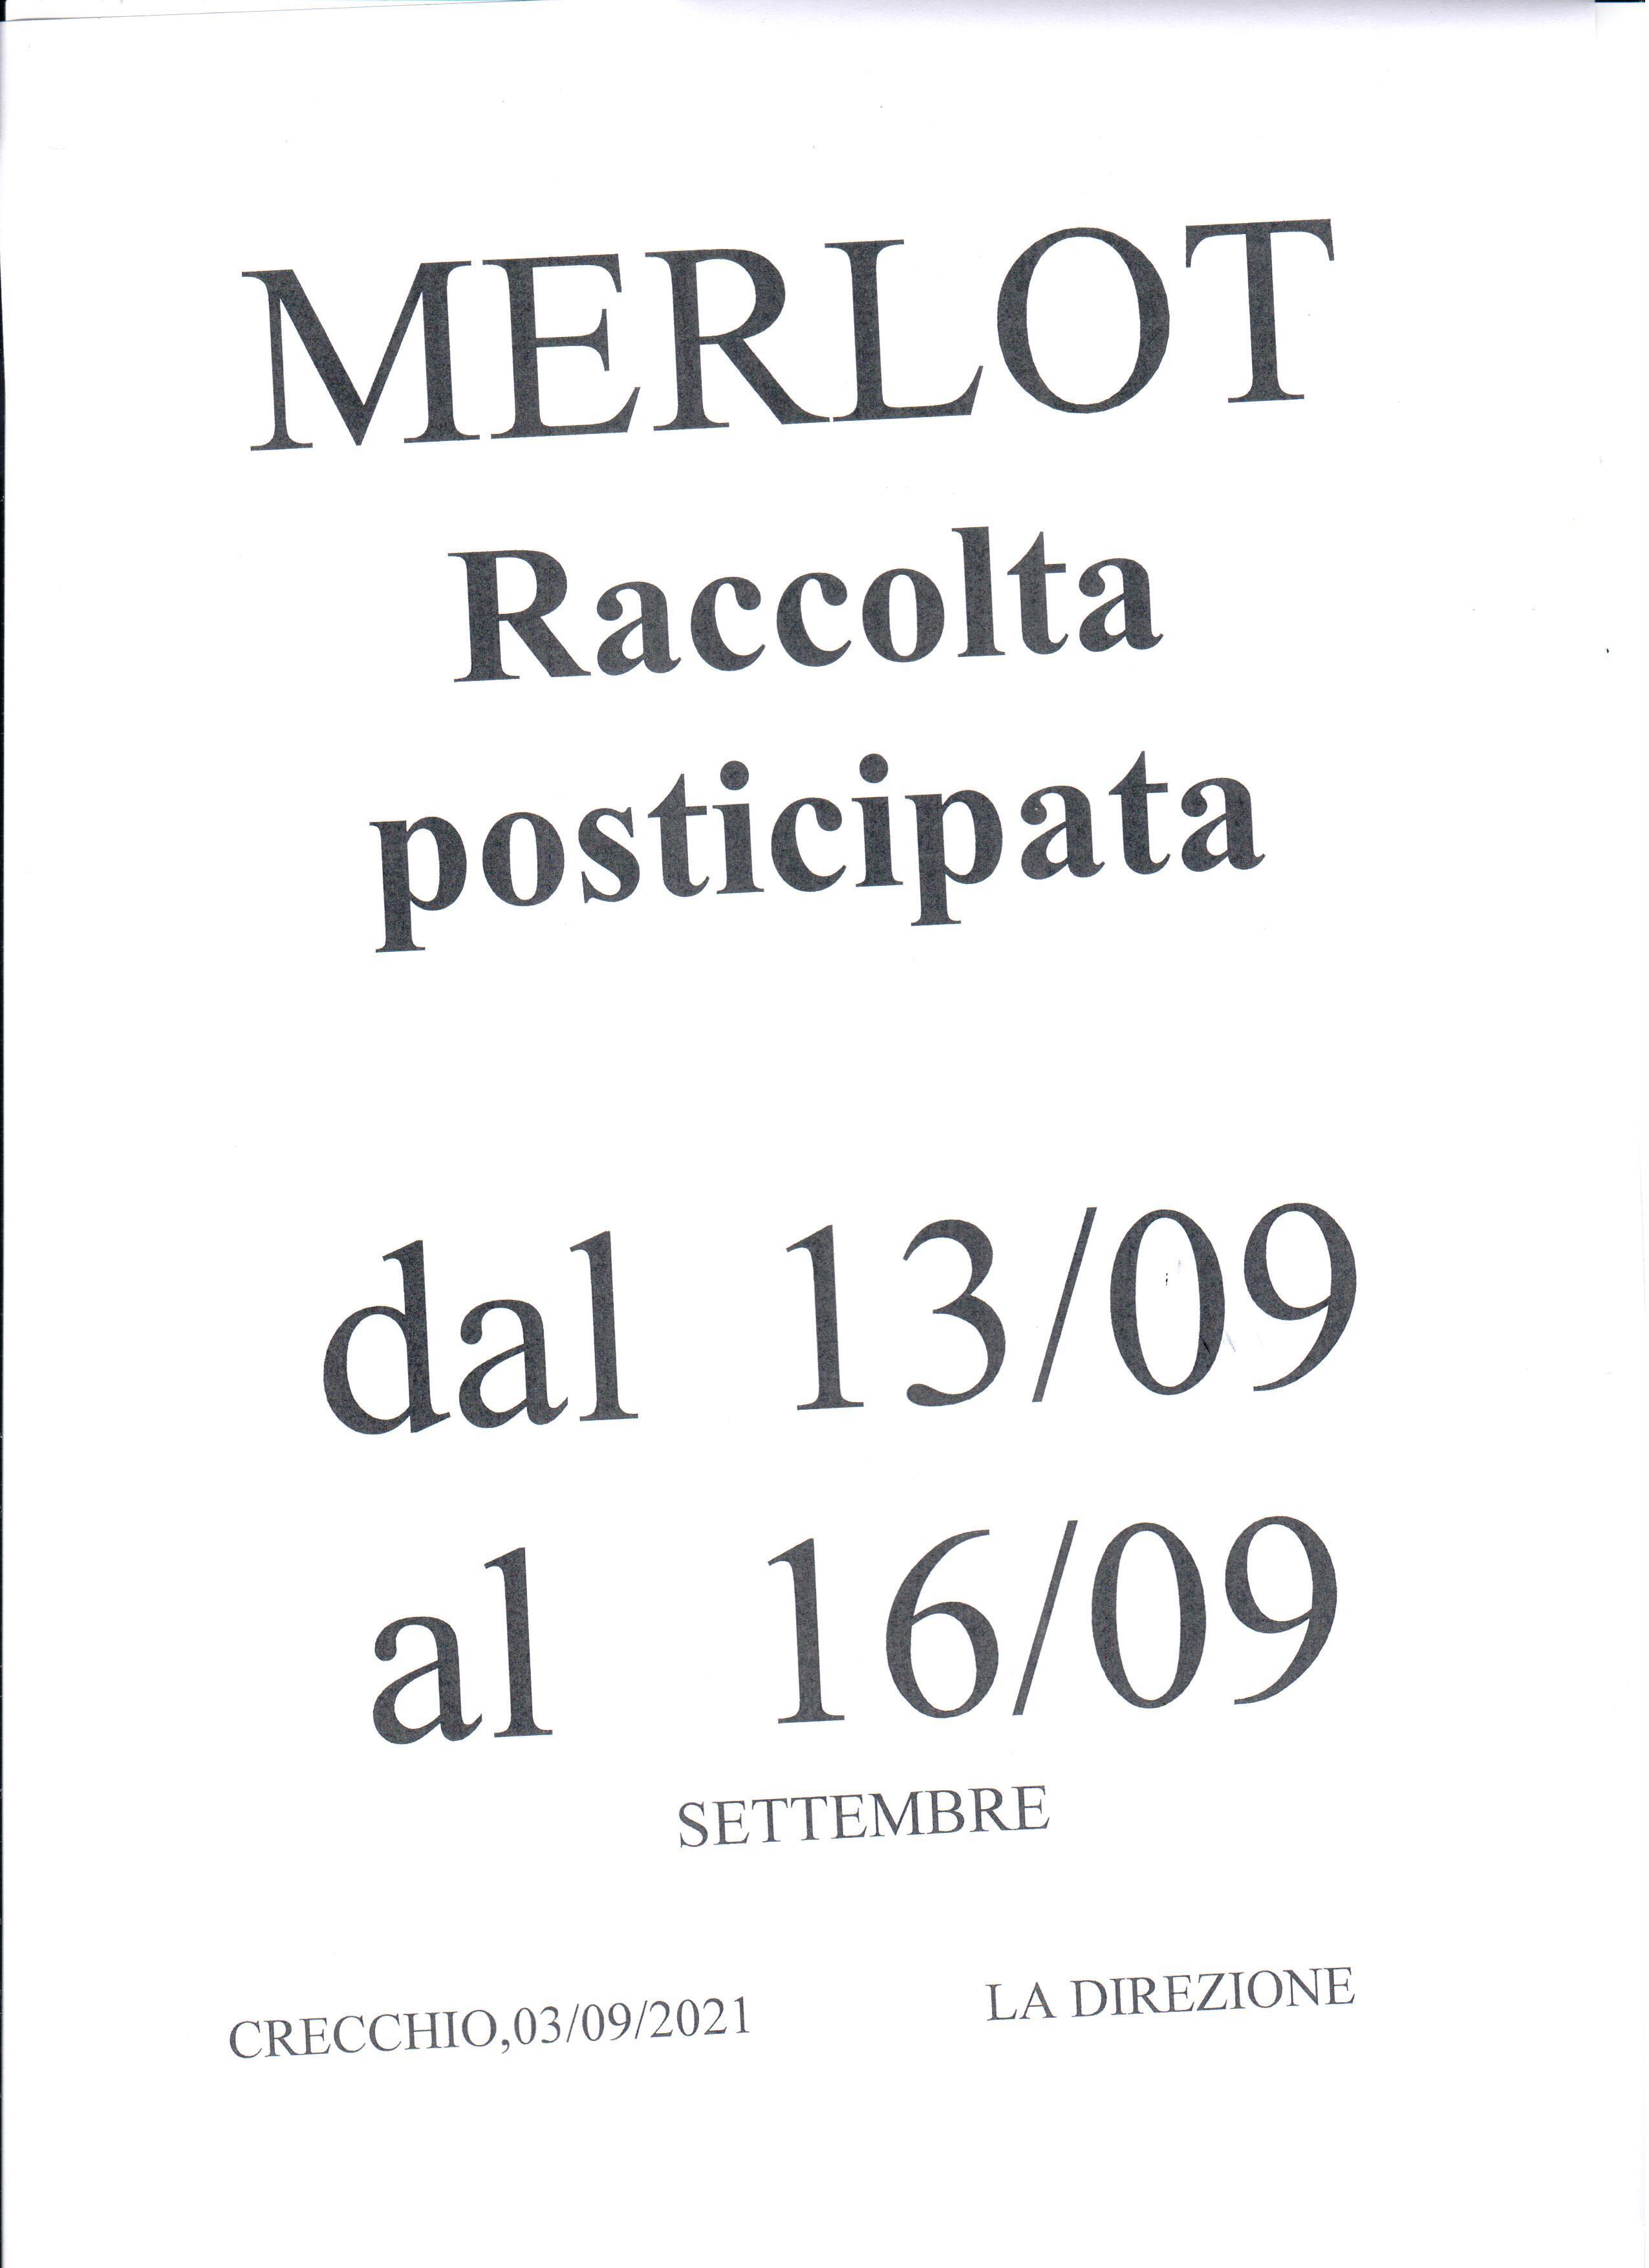 RACCOLTA MERLOT DAL 13/09 AL 16/09